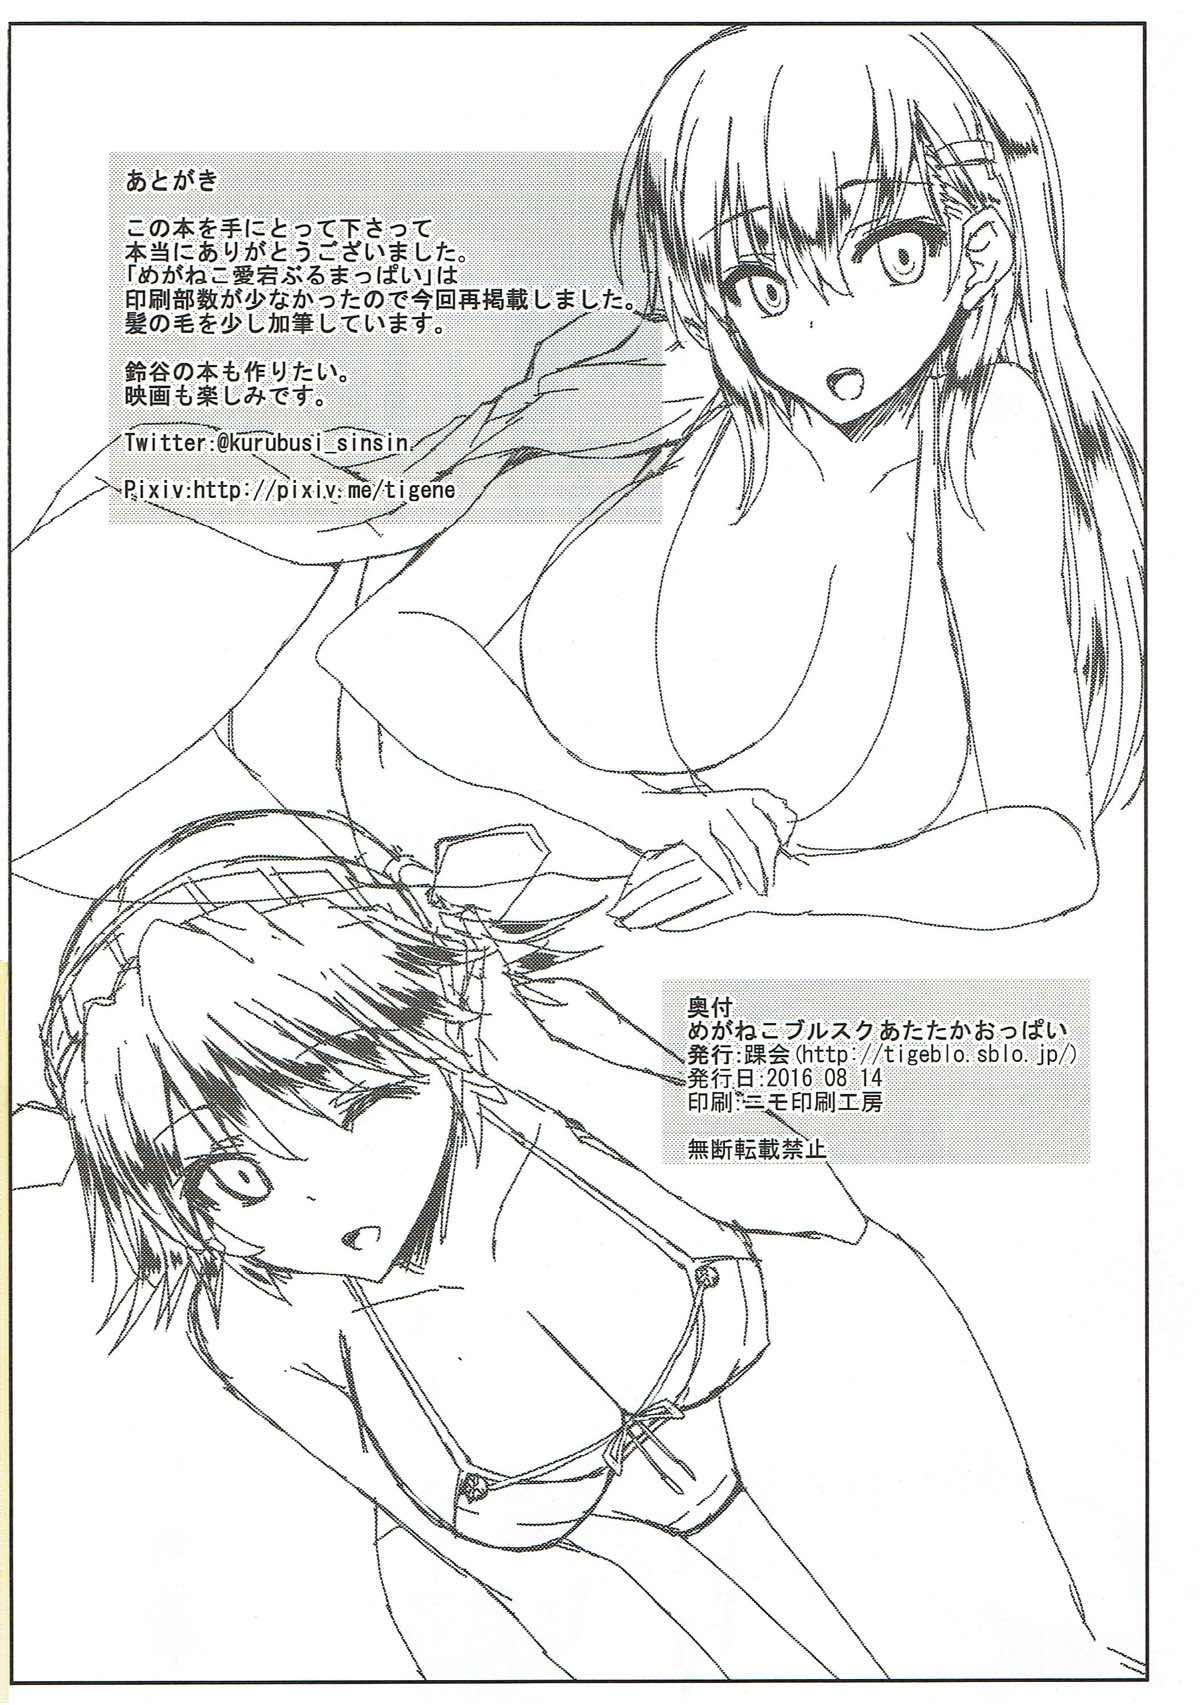 MegaNekoBlooSuku Atataka Oppai 28